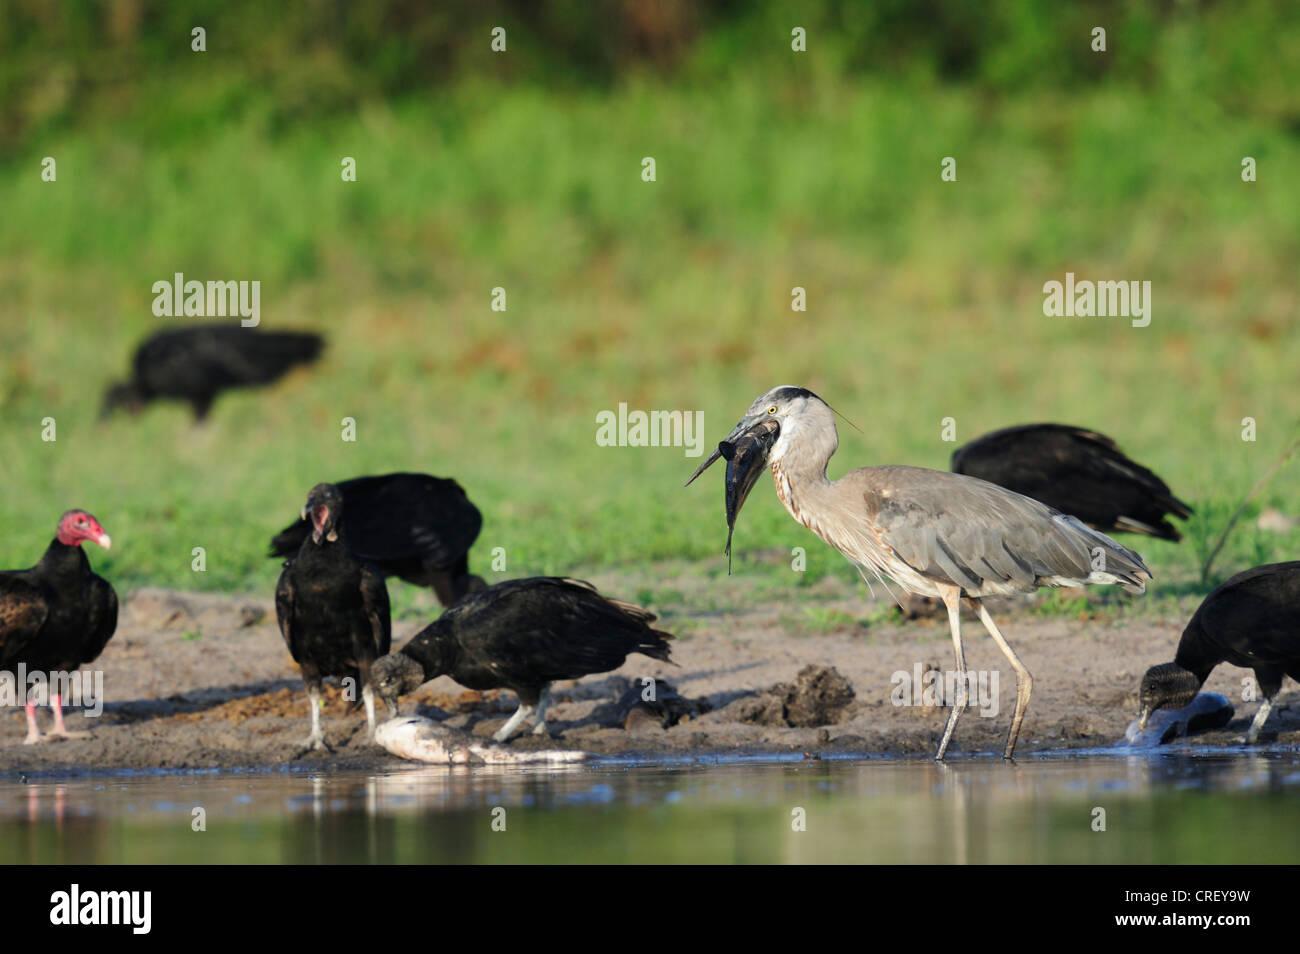 Great Blue Heron (Ardea herodias), adult with fish prey among vultures, Dinero, Lake Corpus Christi, South Texas, - Stock Image